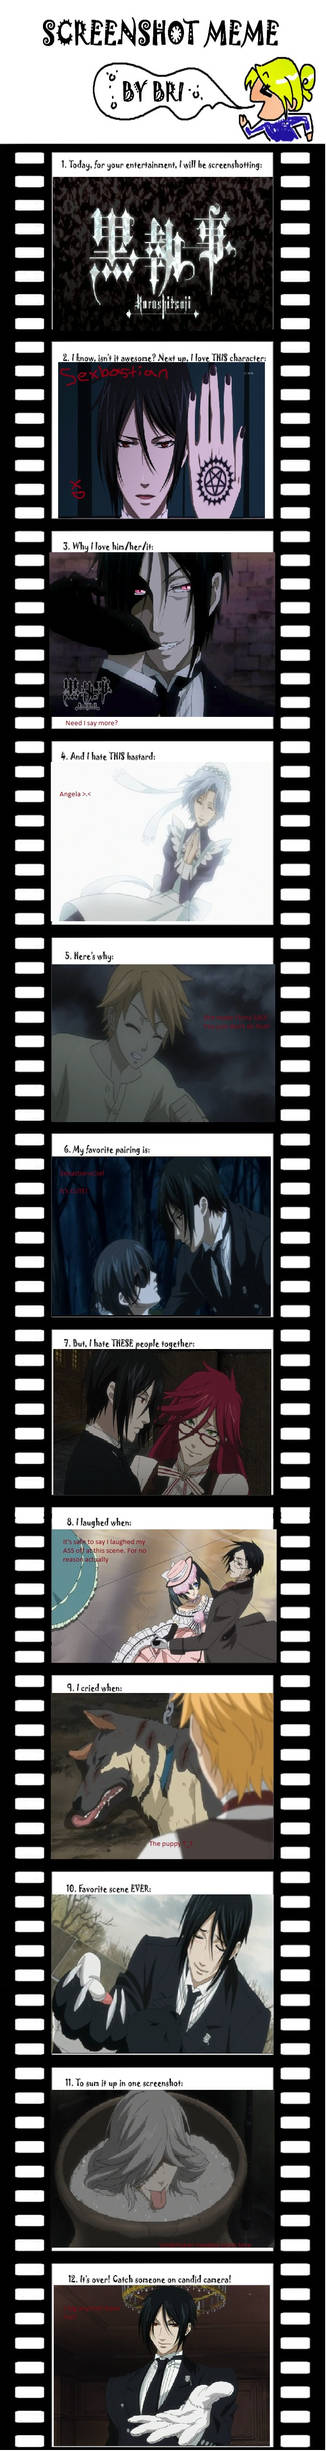 Kuroshitsuji screenshot meme